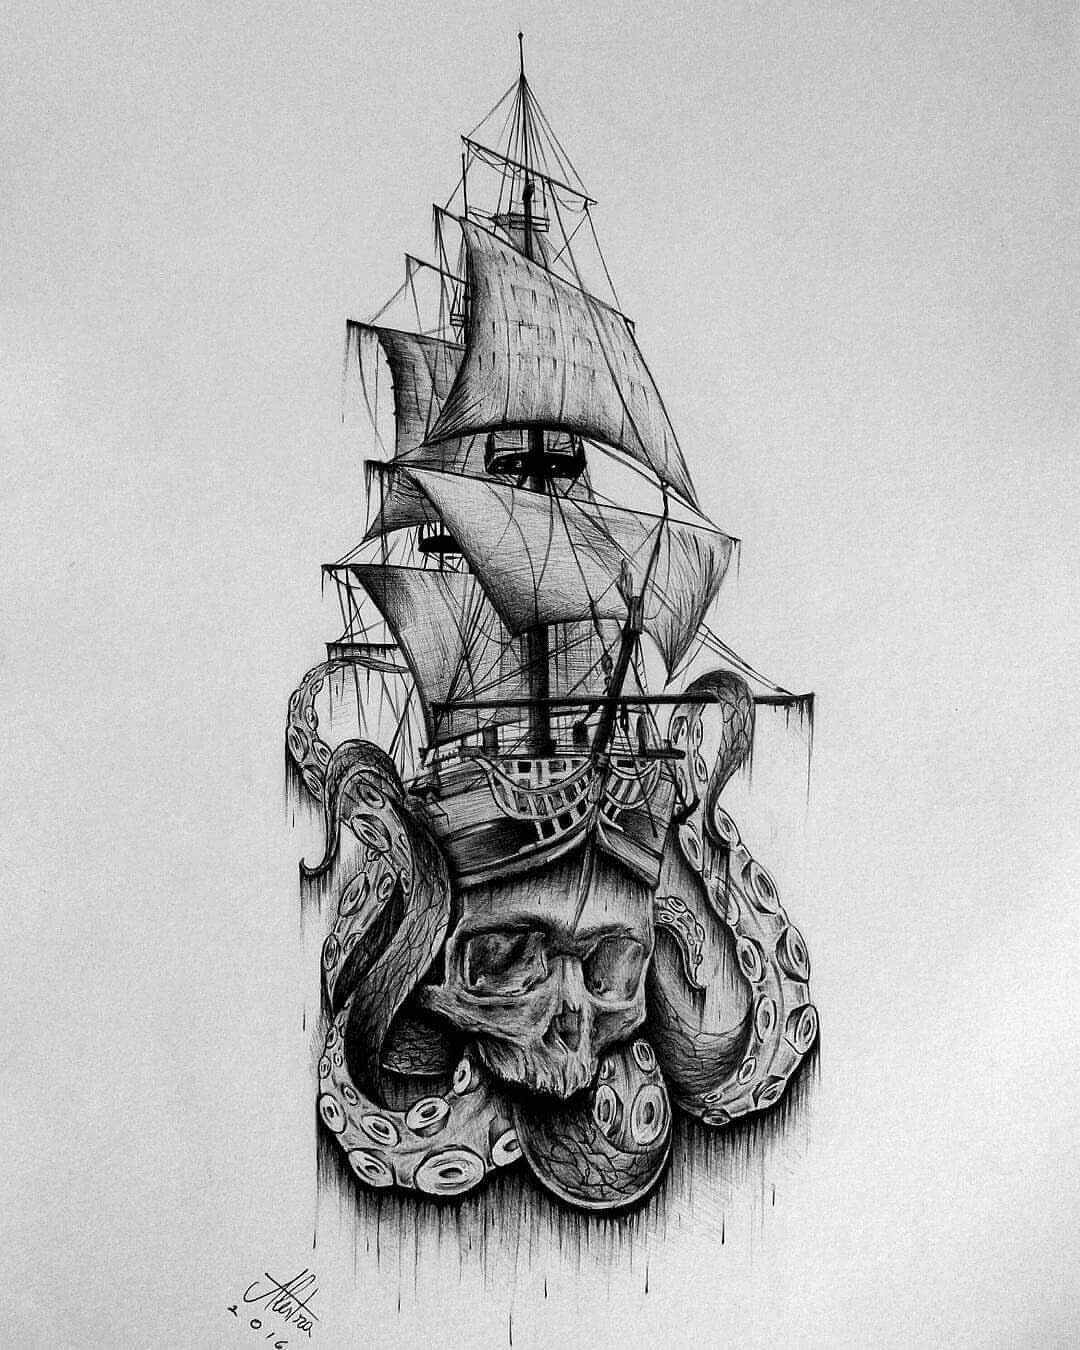 Pirate Ship Tattoo Design: Tatuaje Pirata, Tatuajes Náuticos Y Tatuaje Kraken